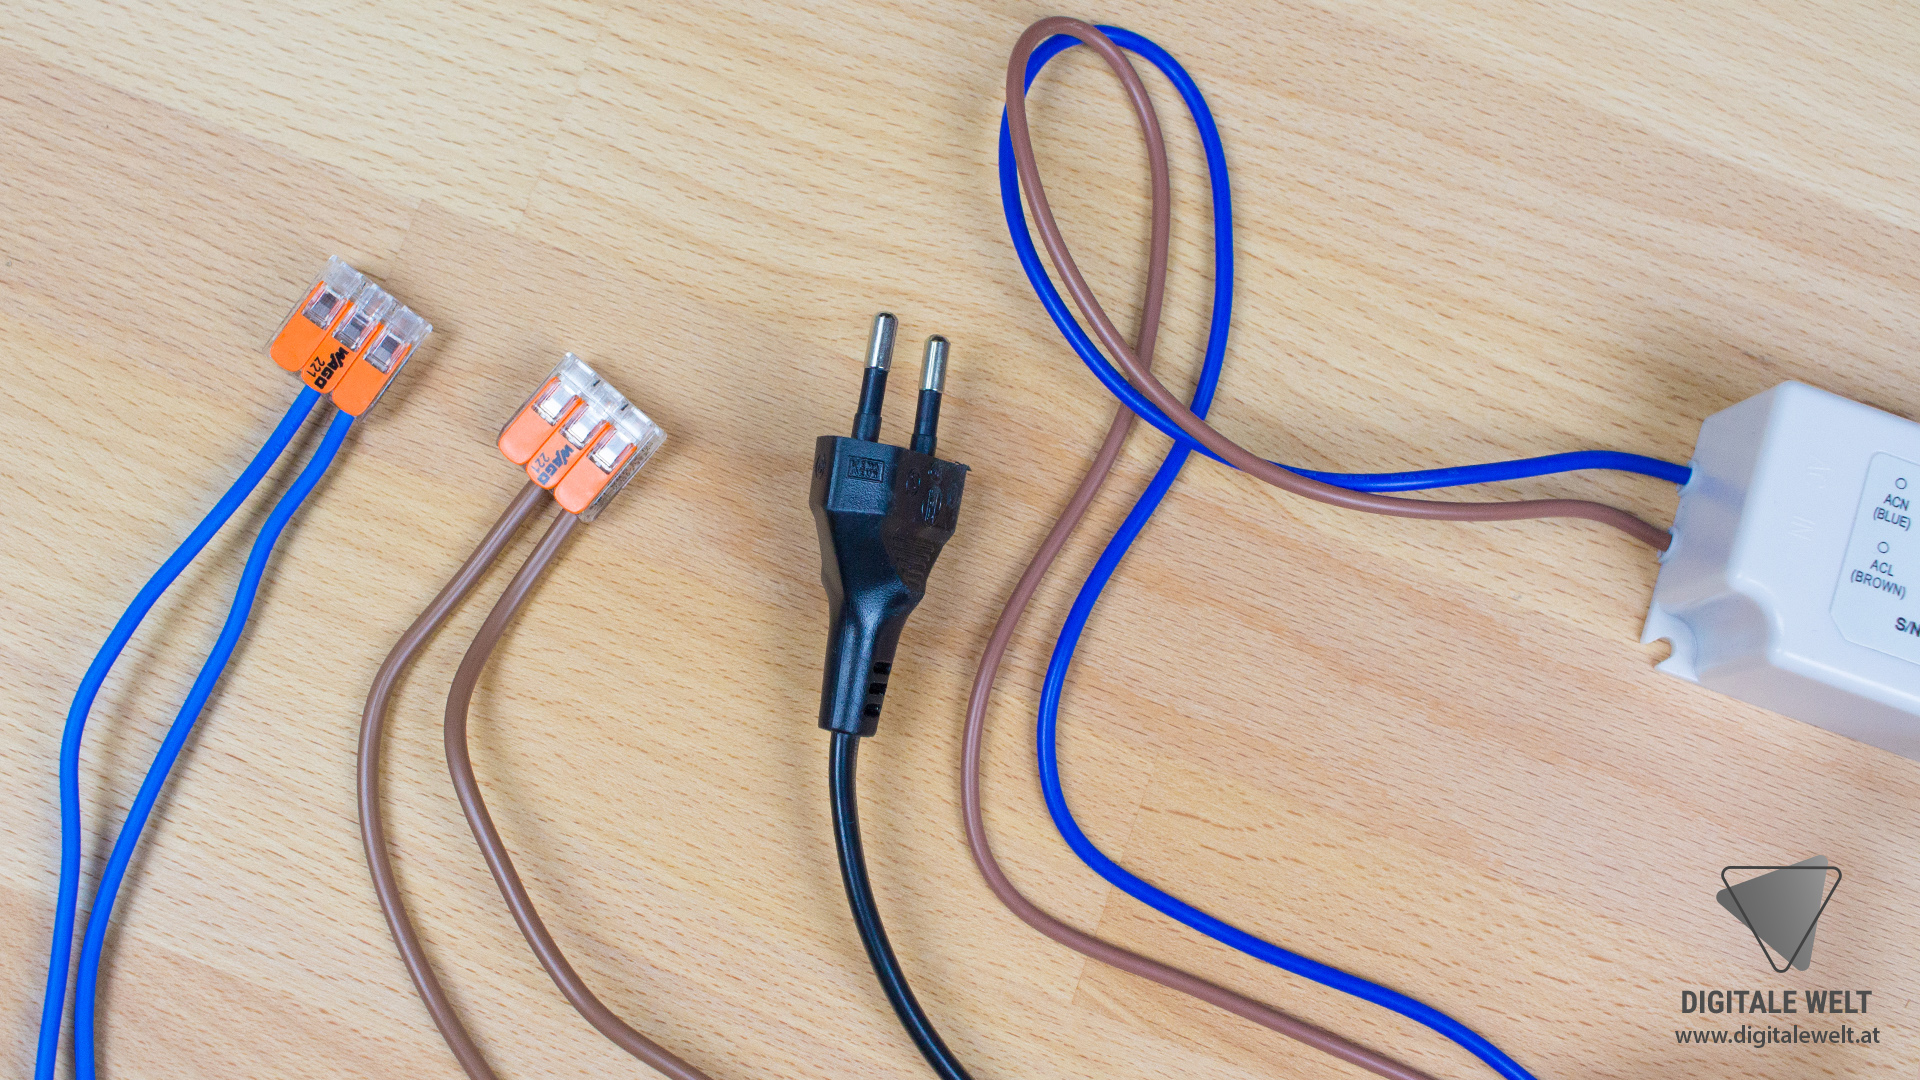 Ambilight ohne Löten - WAGO Klemmen angeschlossen (DigitaleWelt)